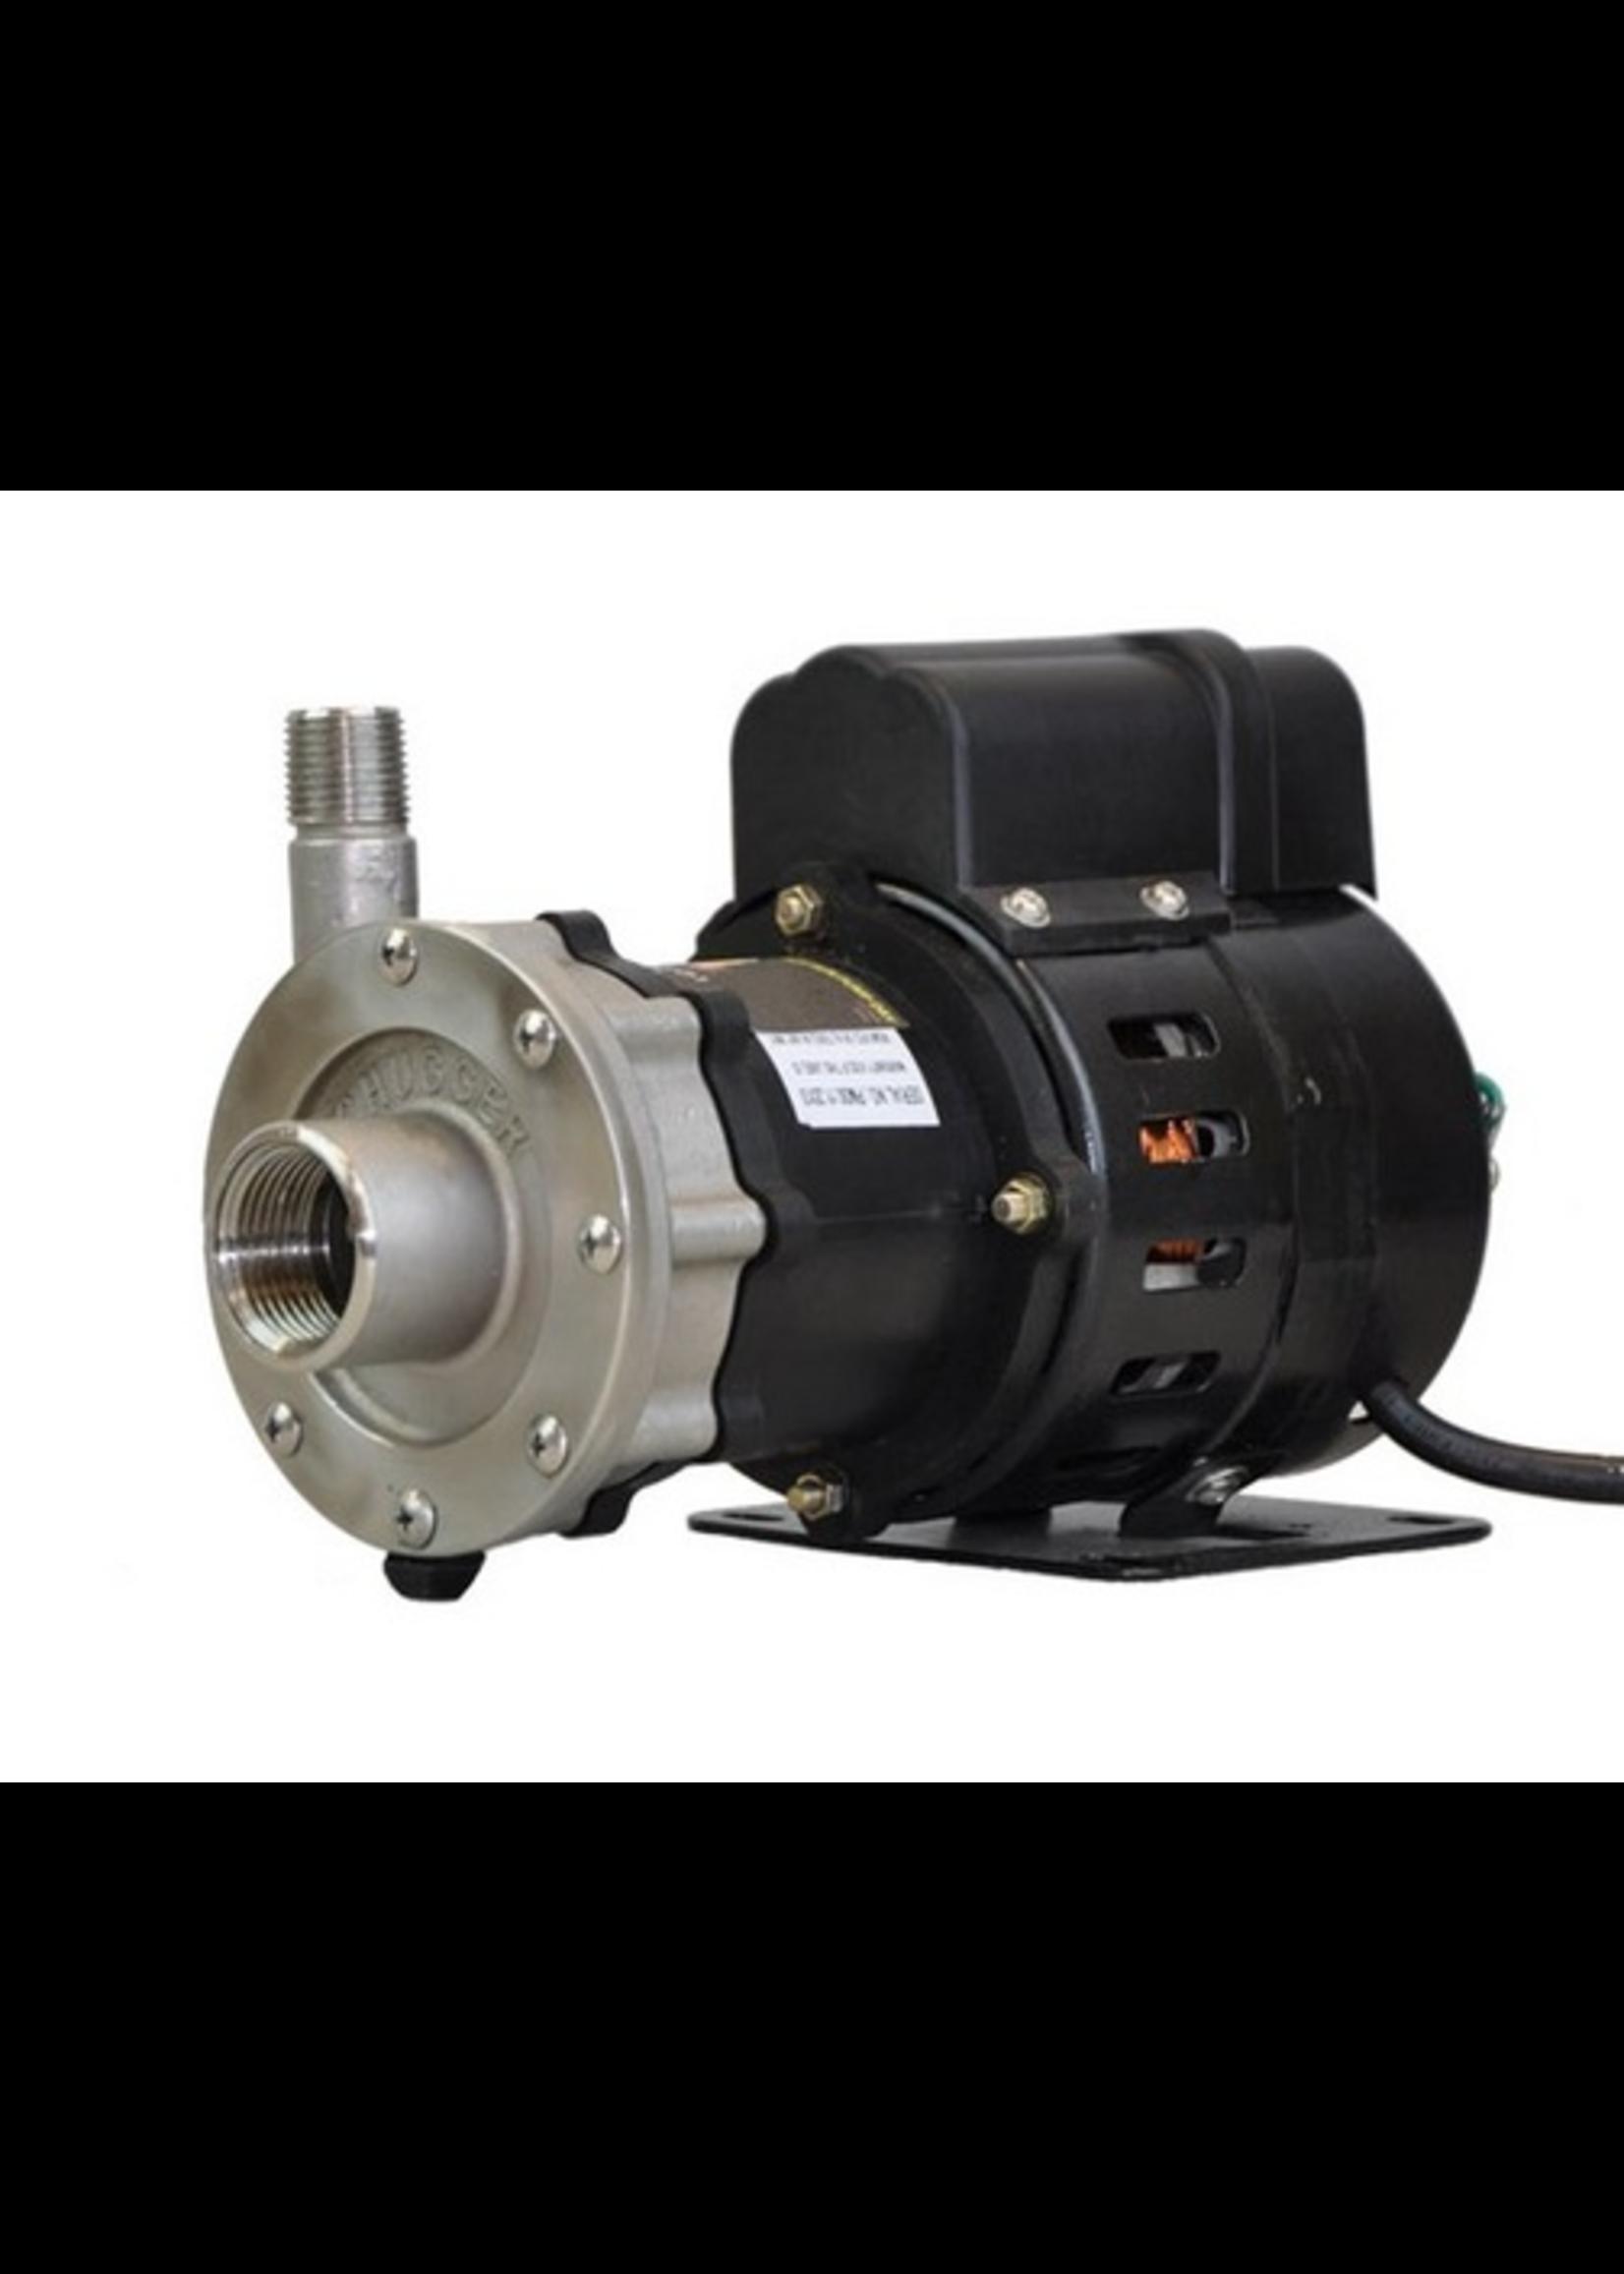 Brewing Chugger Brew Pump - SS Max Series Brew Pump